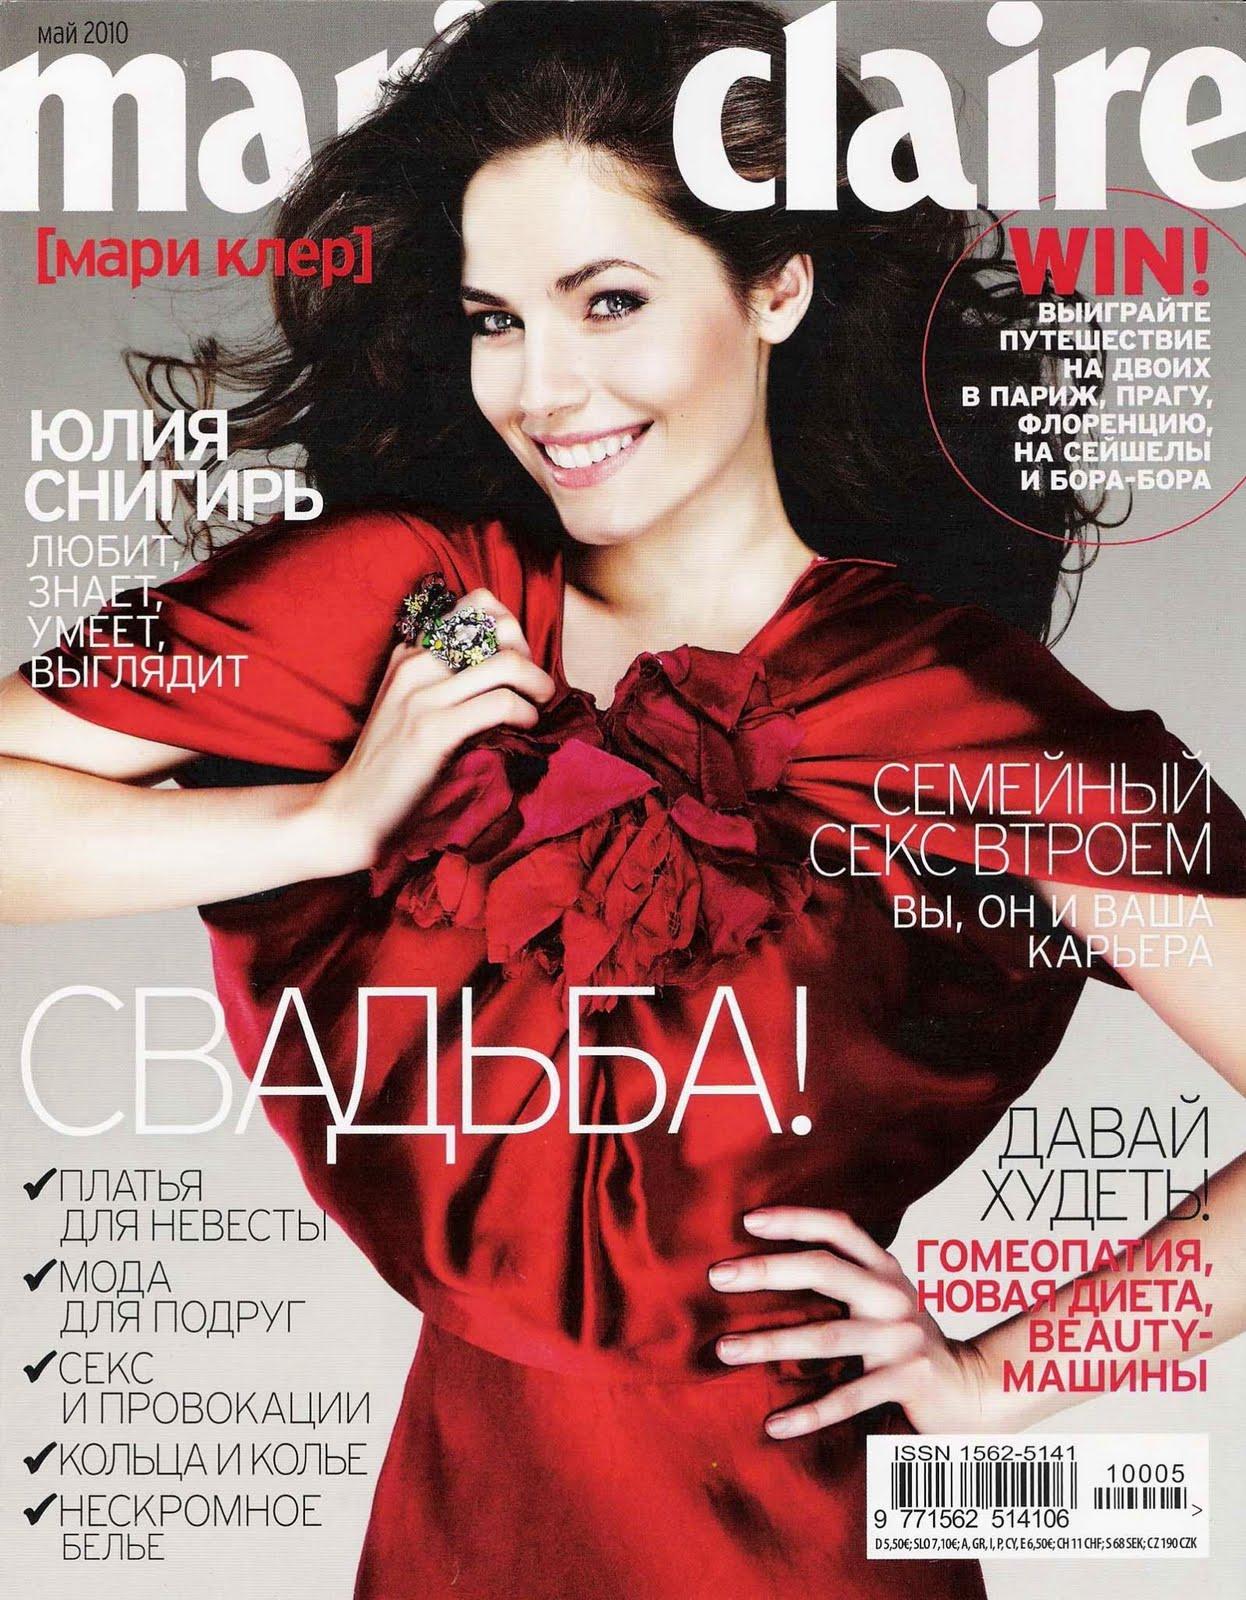 Юлия зимина фото в журнале 3 фотография